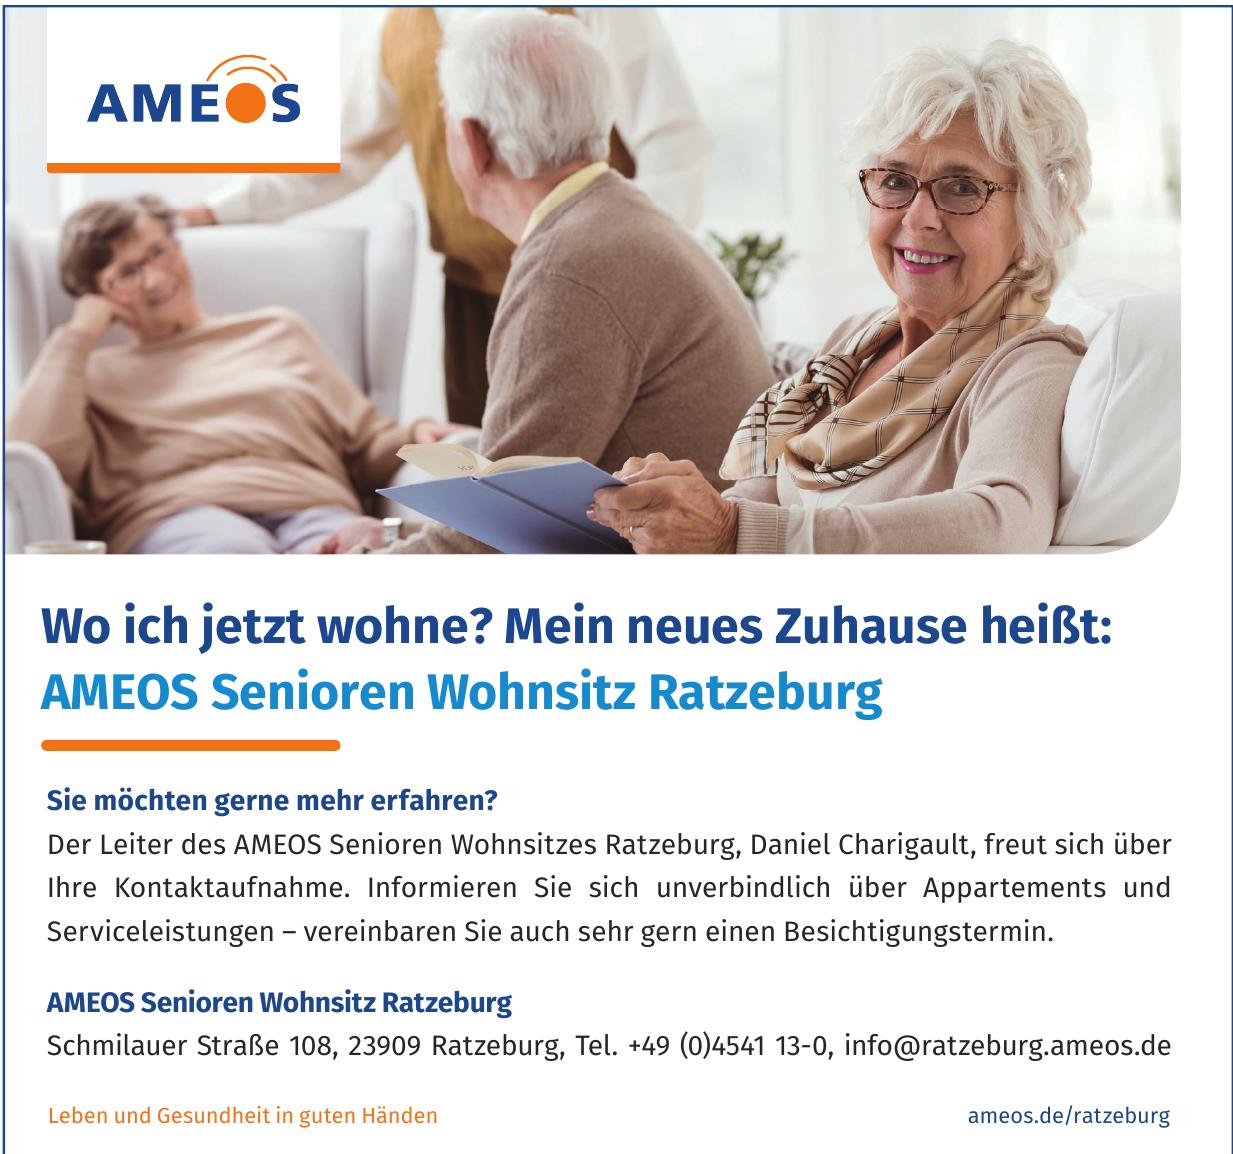 AMEOS Senioren Wohnsitz Ratzeburg